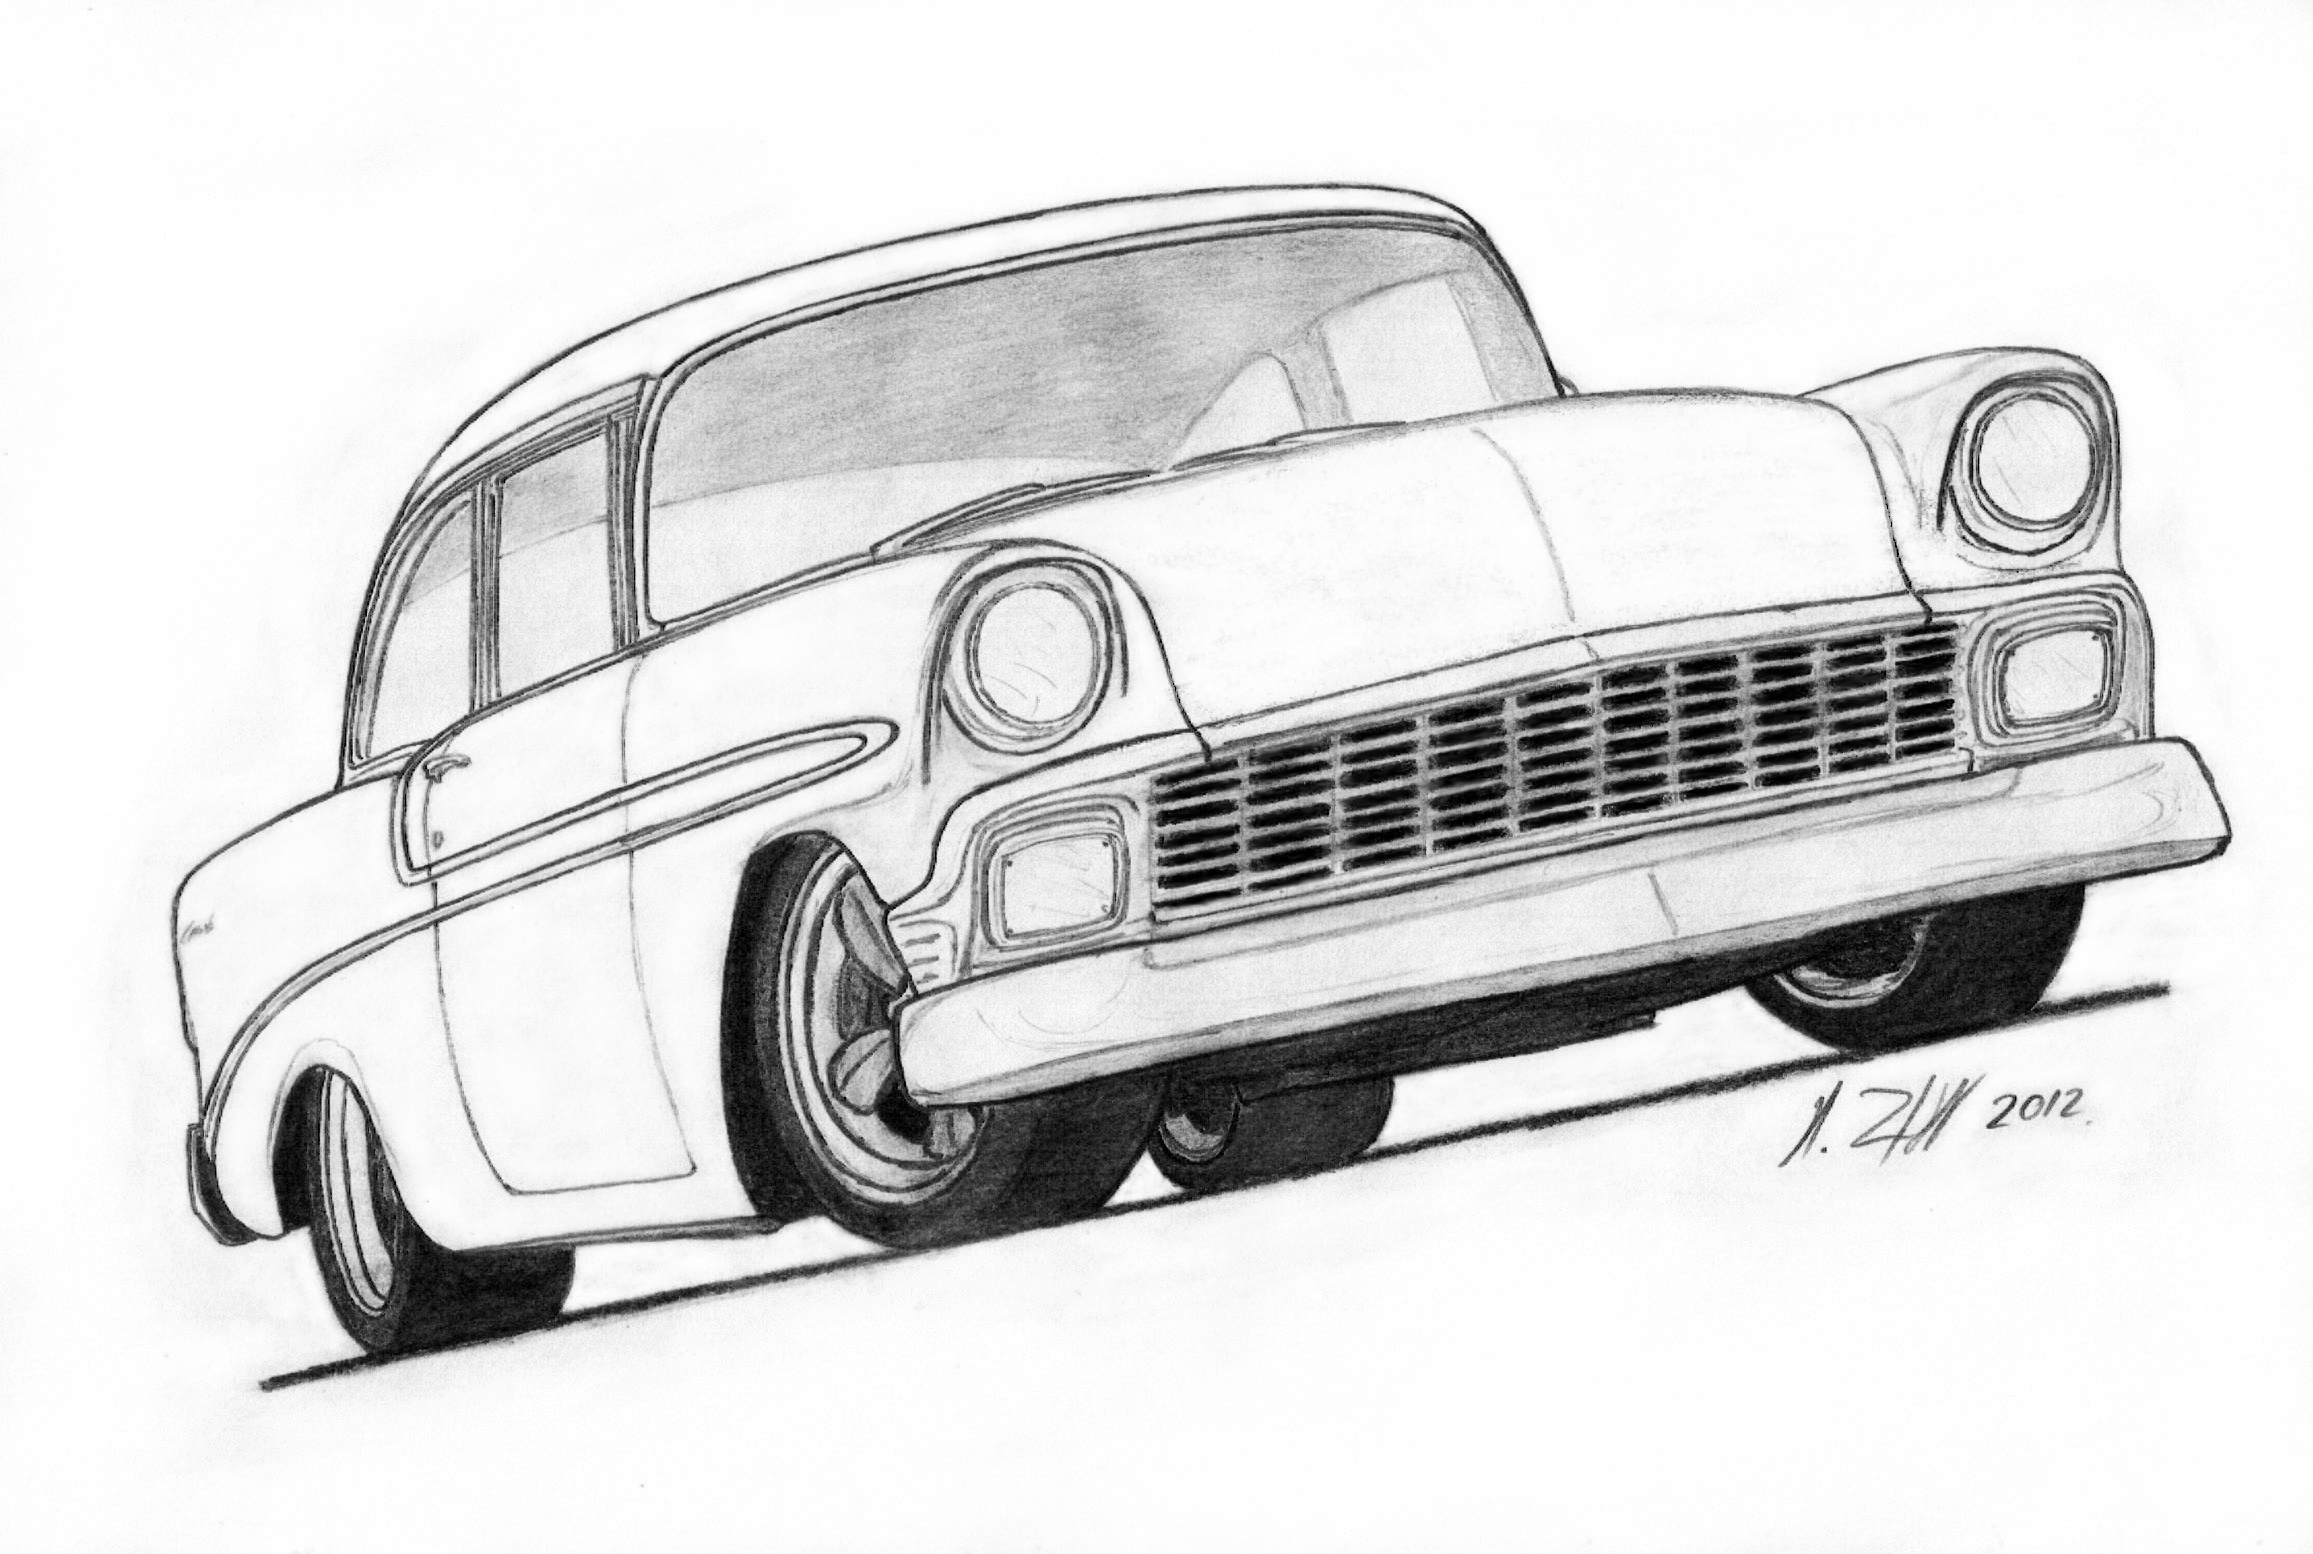 1957 BelAir Drawing.